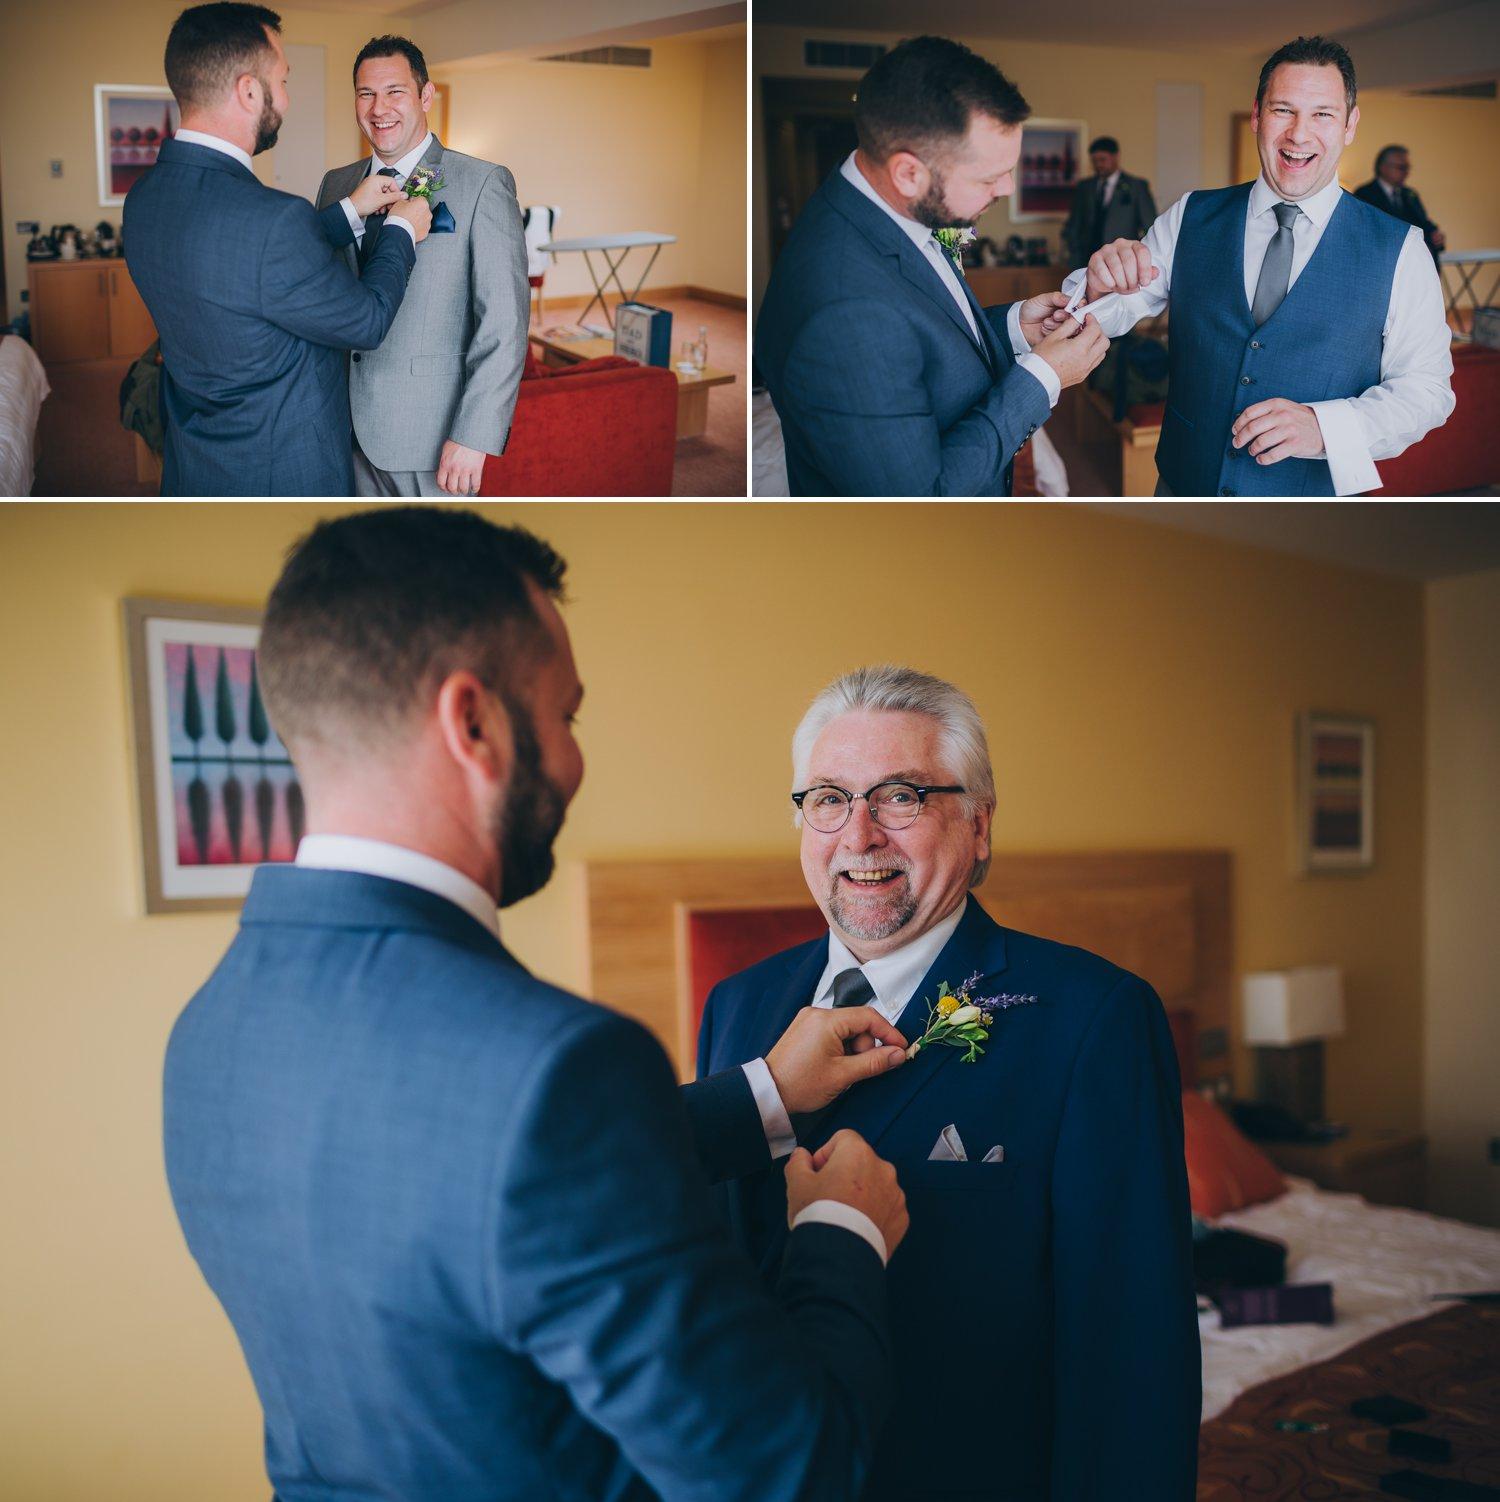 Broyle Place Wedding Photography 3.jpg